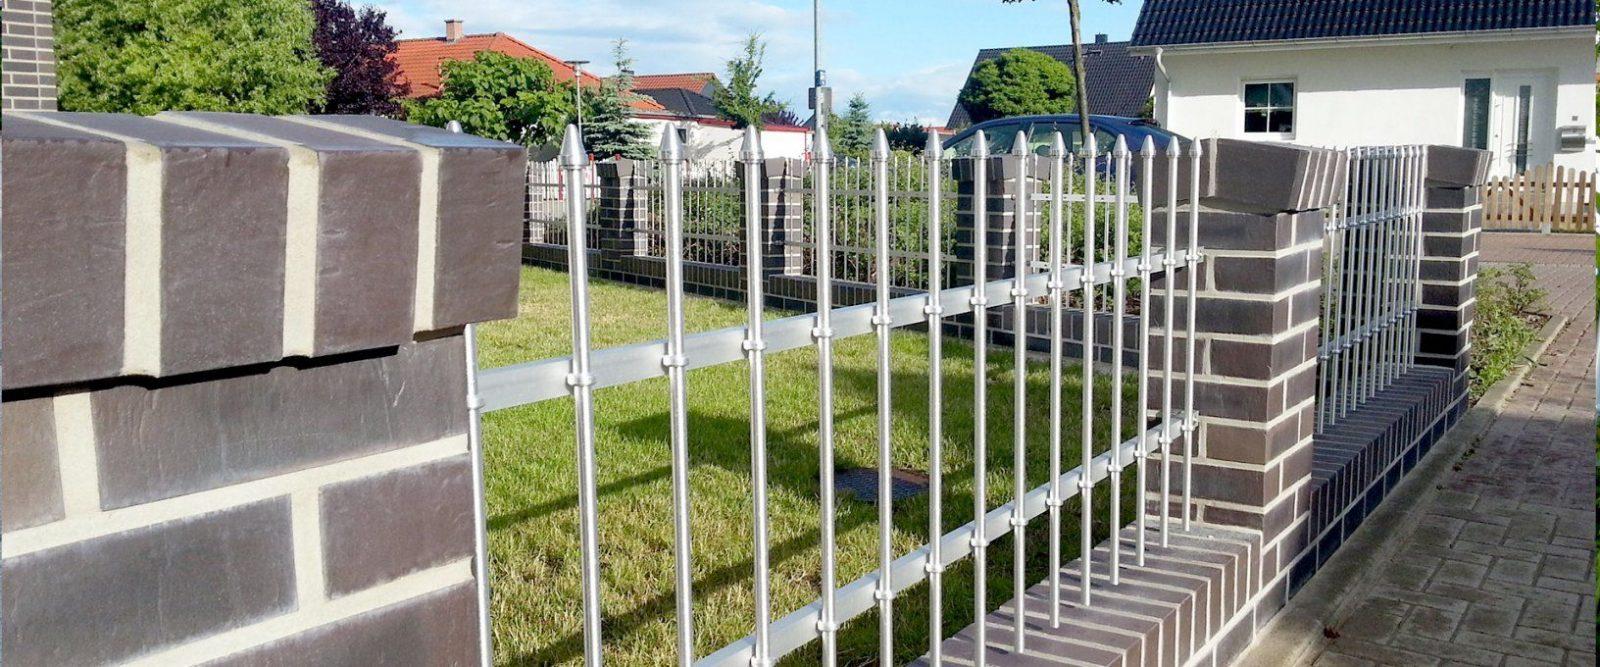 Selbstbauzäune  Zaun Selber Bauen  Seiler Zaun Design von Holzzaun Am Hang Bauen Photo